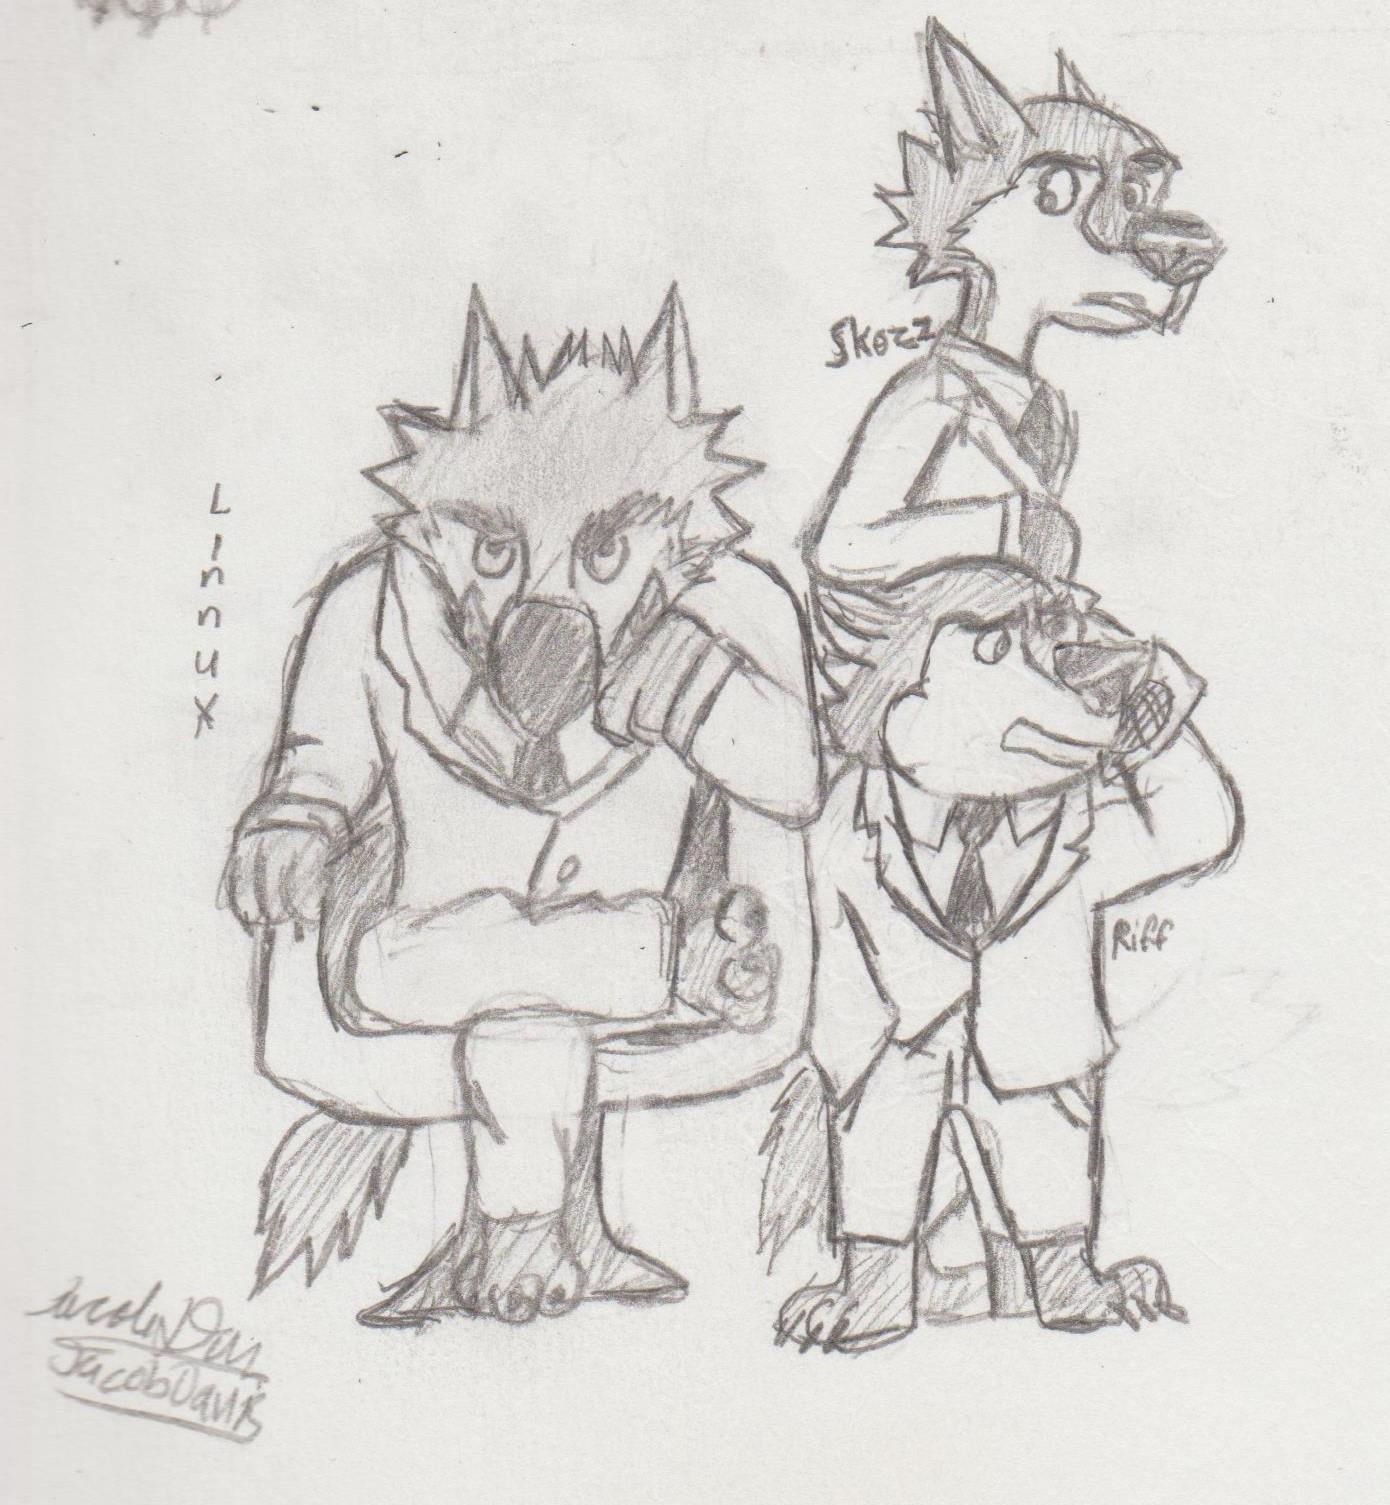 Linnux, Skozz and Trey — Weasyl